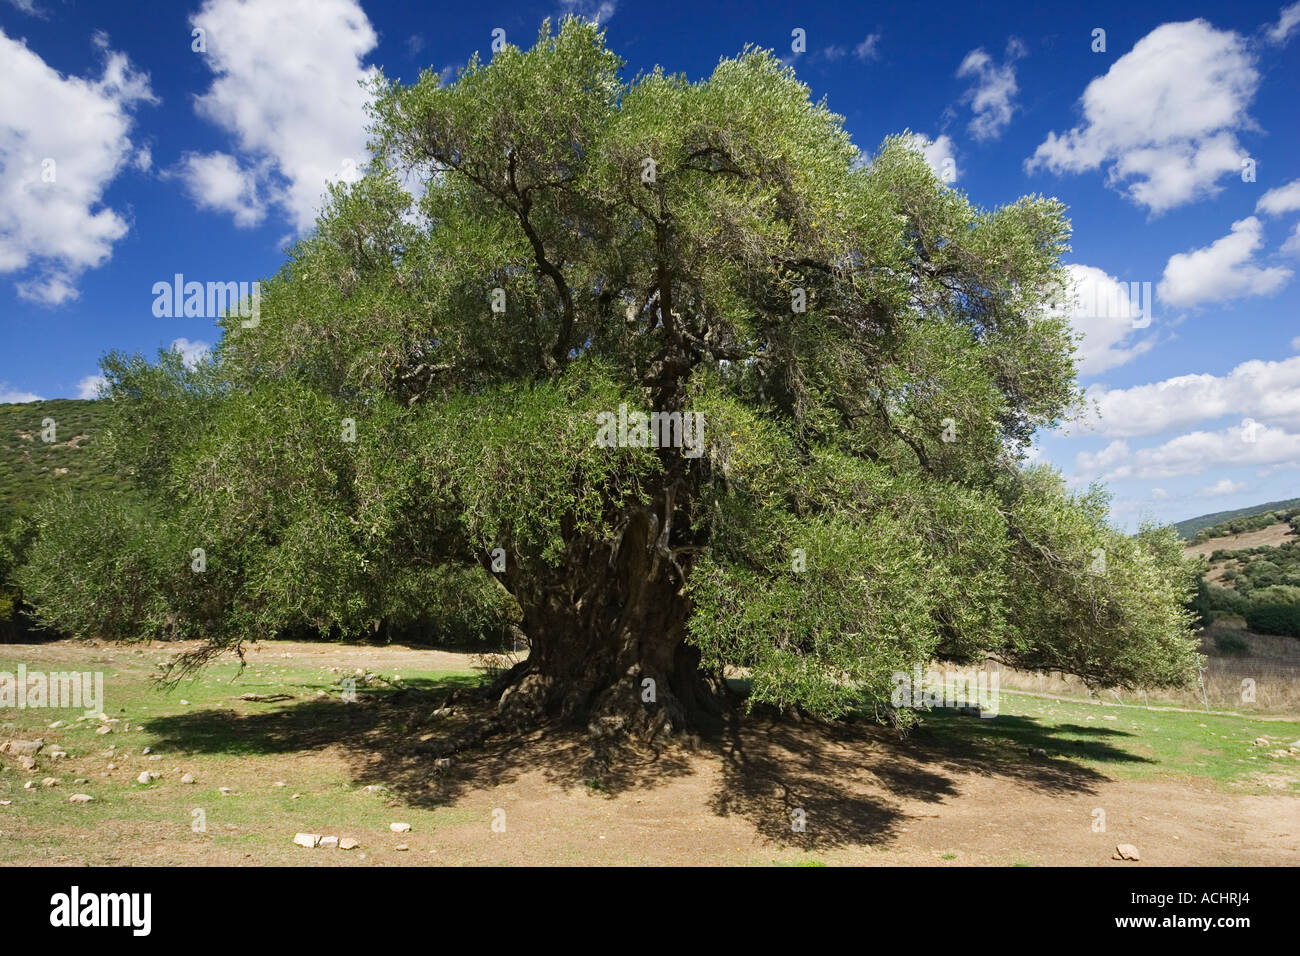 Three thousand years old Olive Tree, Olivastri millenari, Sardinia, Italy - Stock Image